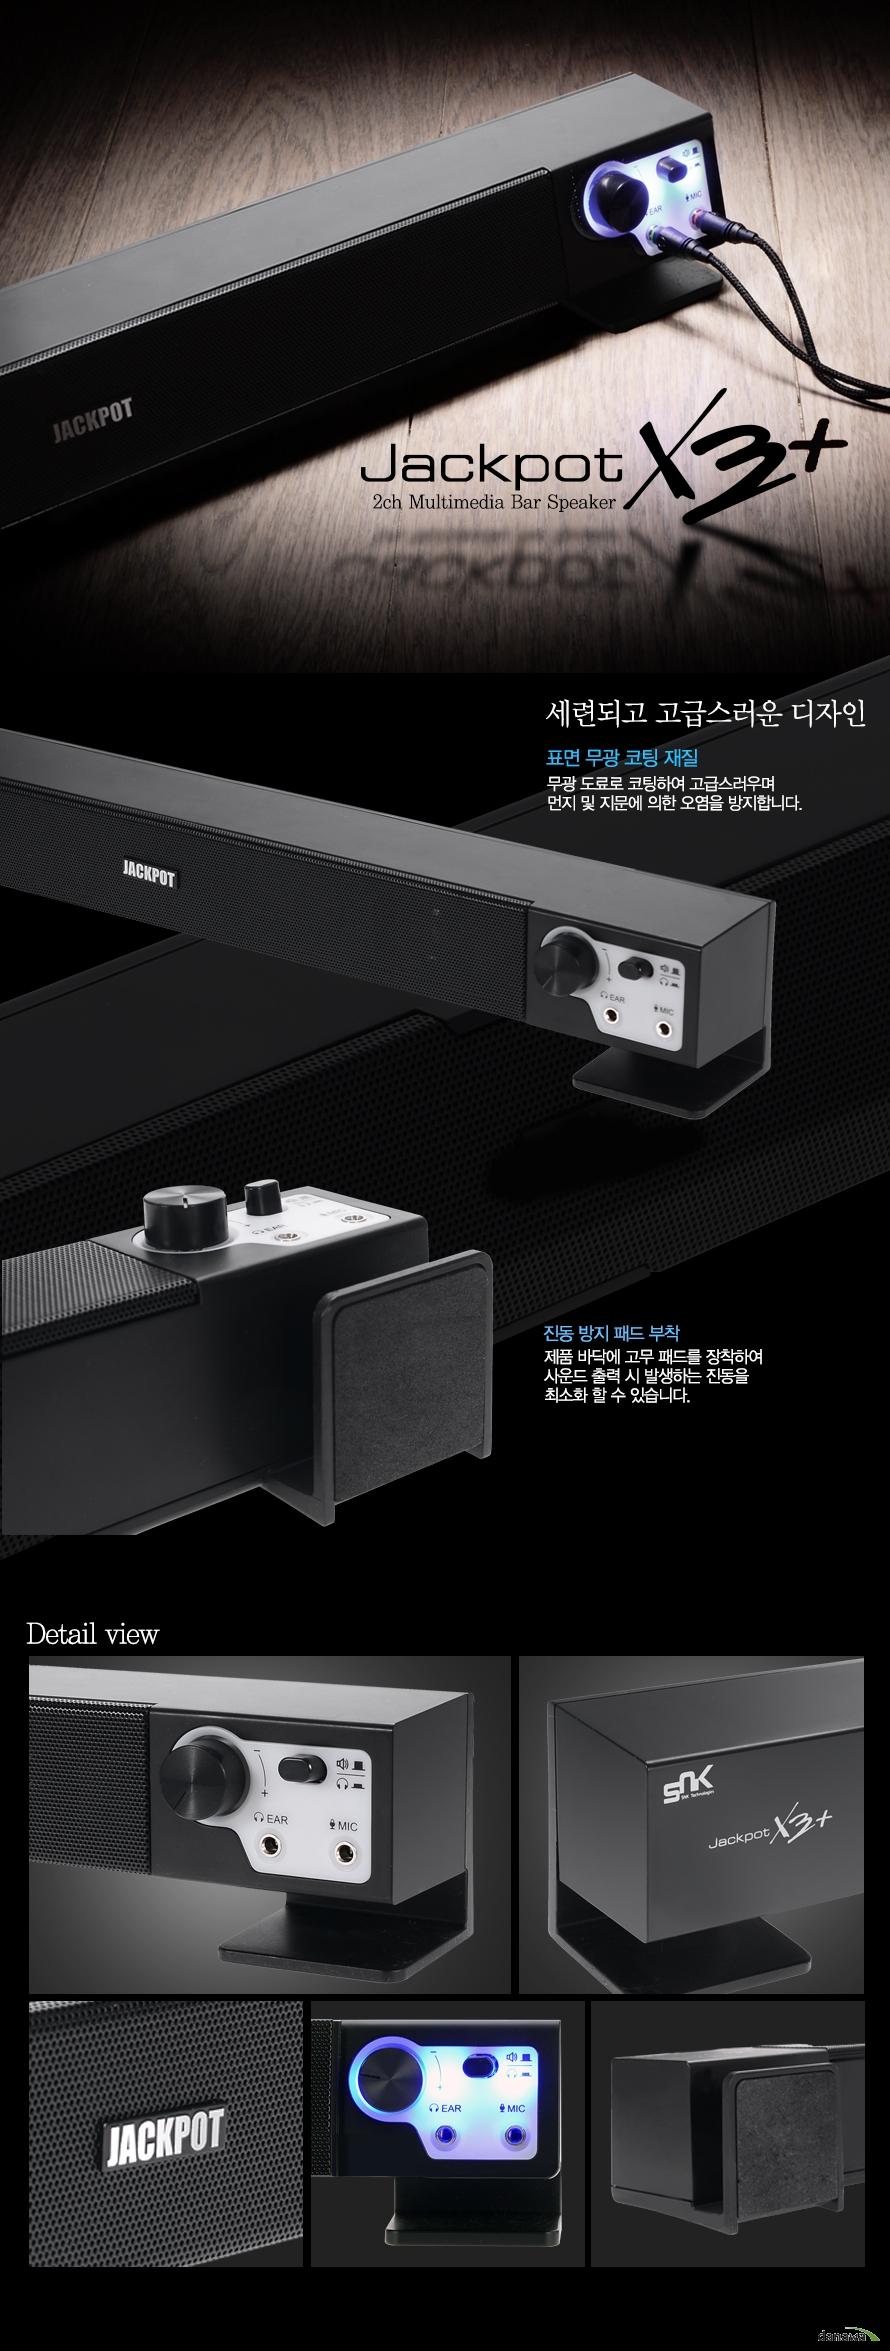 Jackpot X3+     2ch multimedia bar speaker x3+    세련되고 고급스러운 디자인 표면 무광 코팅 재질 무광 도료로 코팅하여 고급스러우며 먼지 및 지문에 의한 오염을 방지합니다.    진동 방지 패드 부착 제품바닥에 고무 패드를 장착하여 사운드 출력 시 발생하는 진동을 최소화 할 수 있습니다